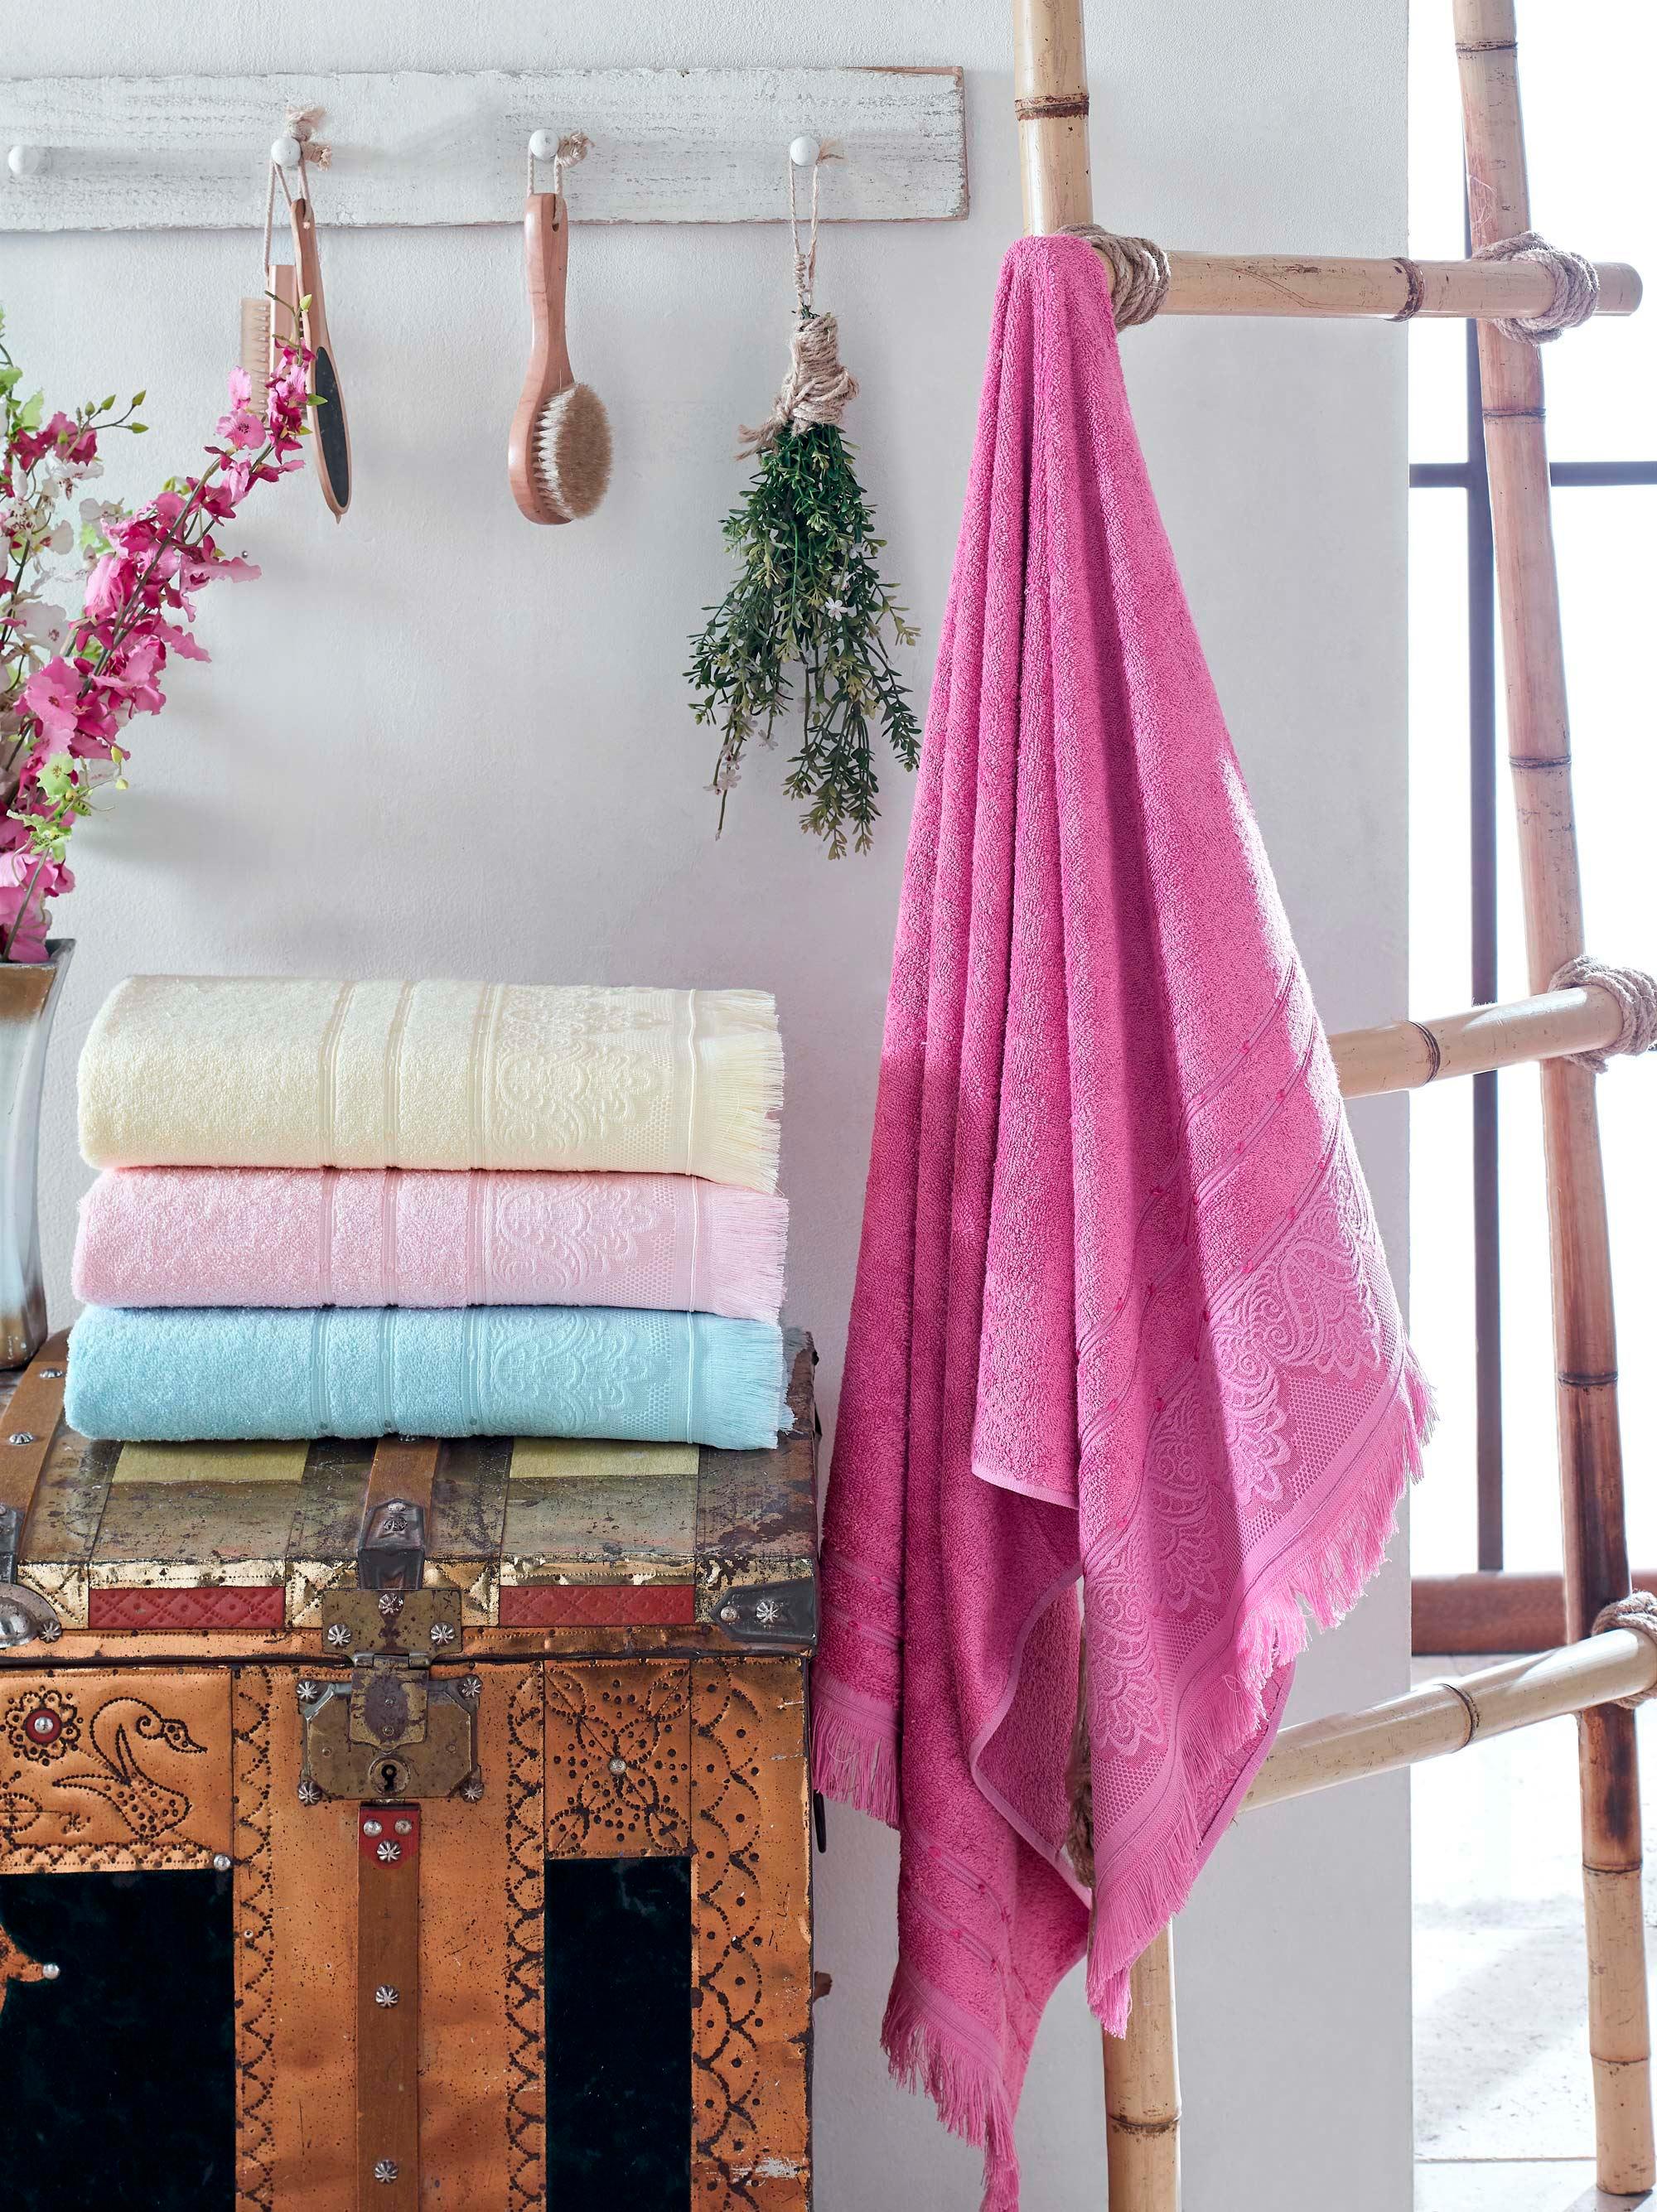 Купить Полотенца DO'n'CO, Полотенце Lavender (50х90 см - 4 шт), Турция, Желтый, Розовый, Бамбук